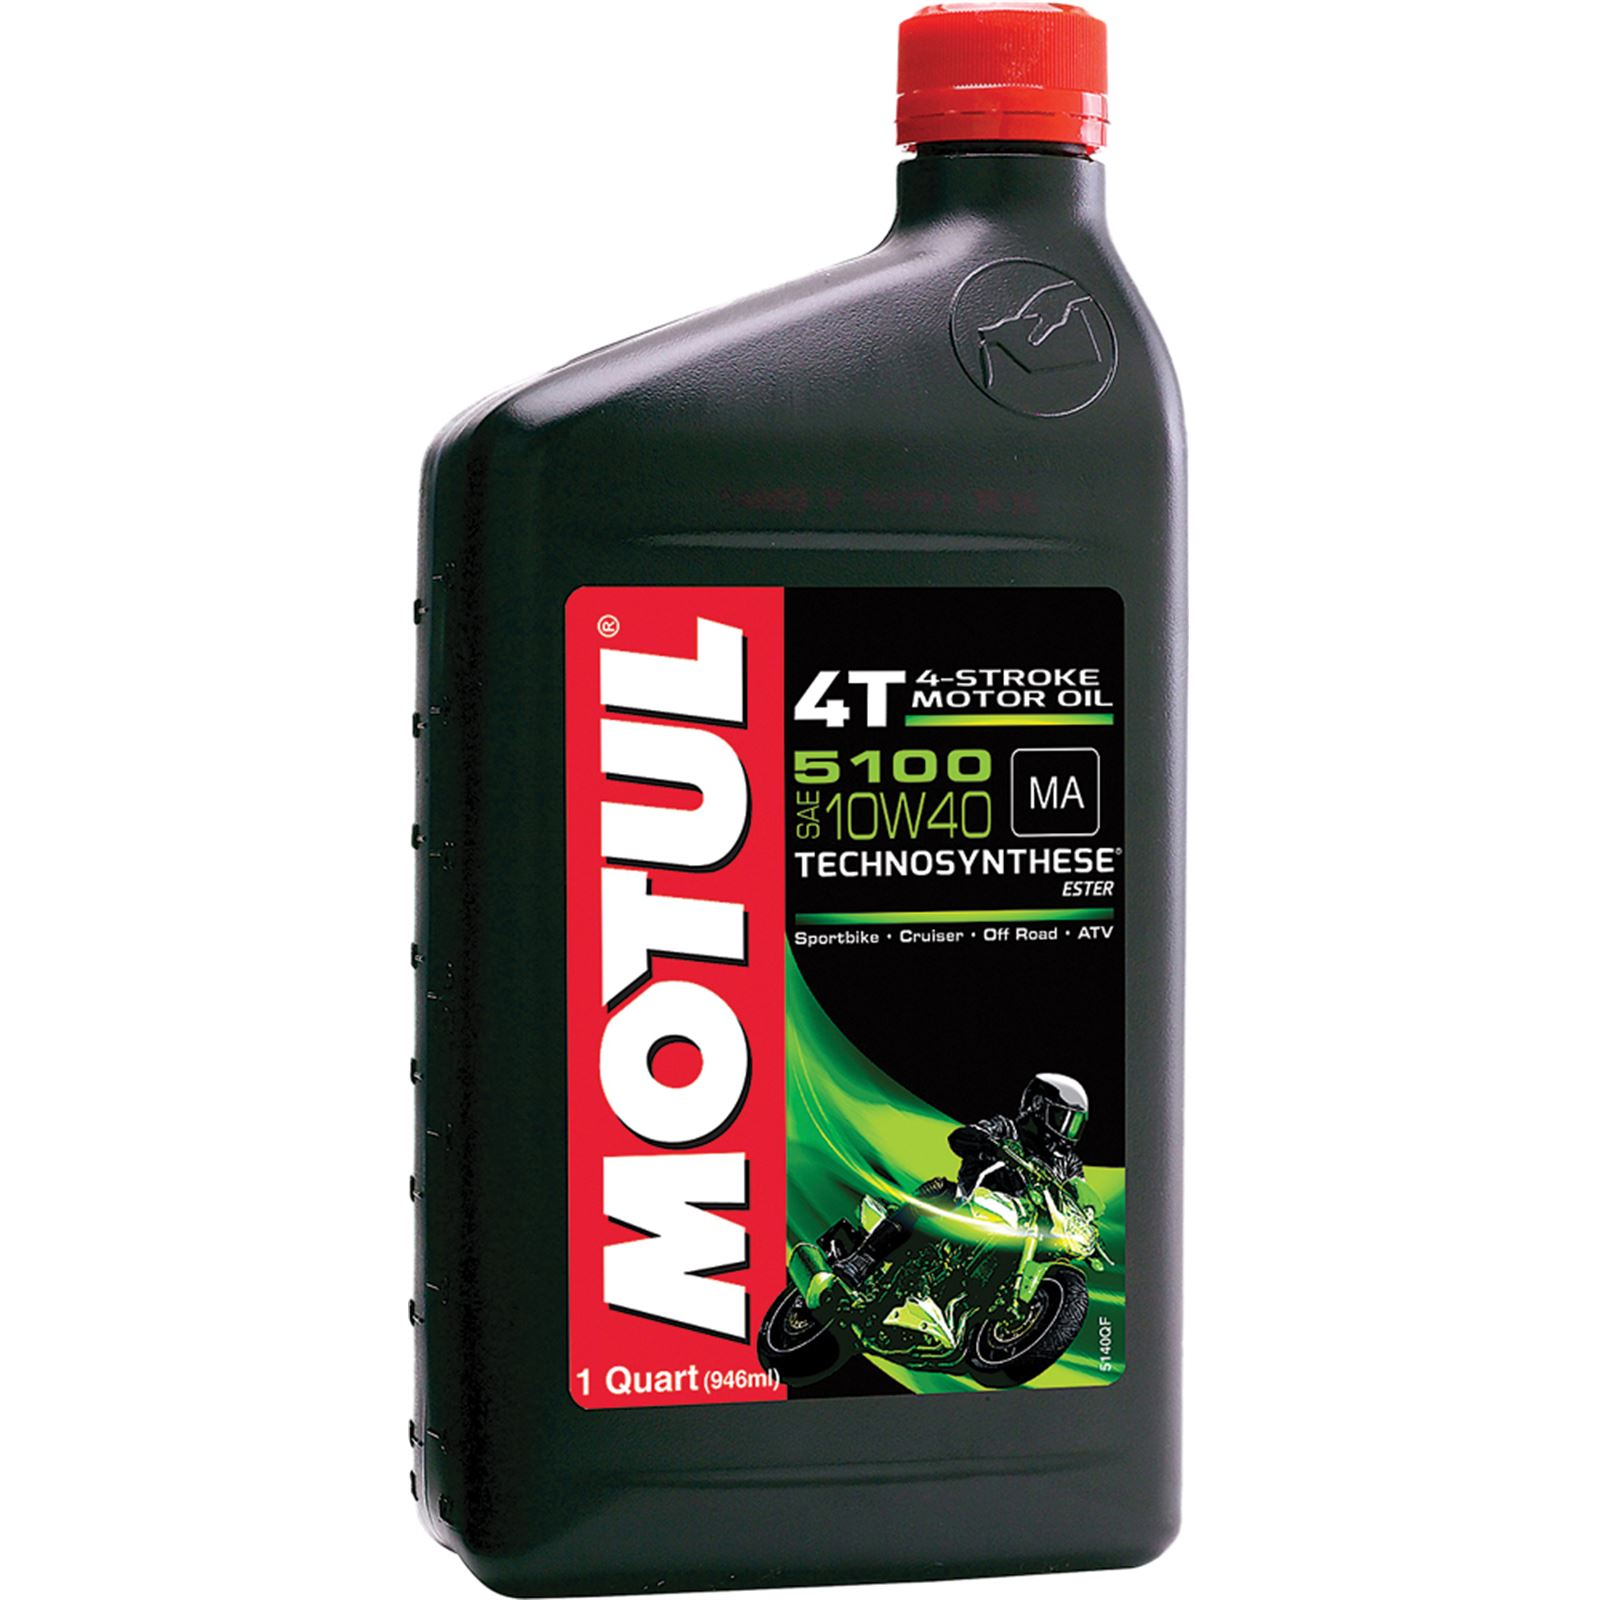 Motul 5100 4T Oil